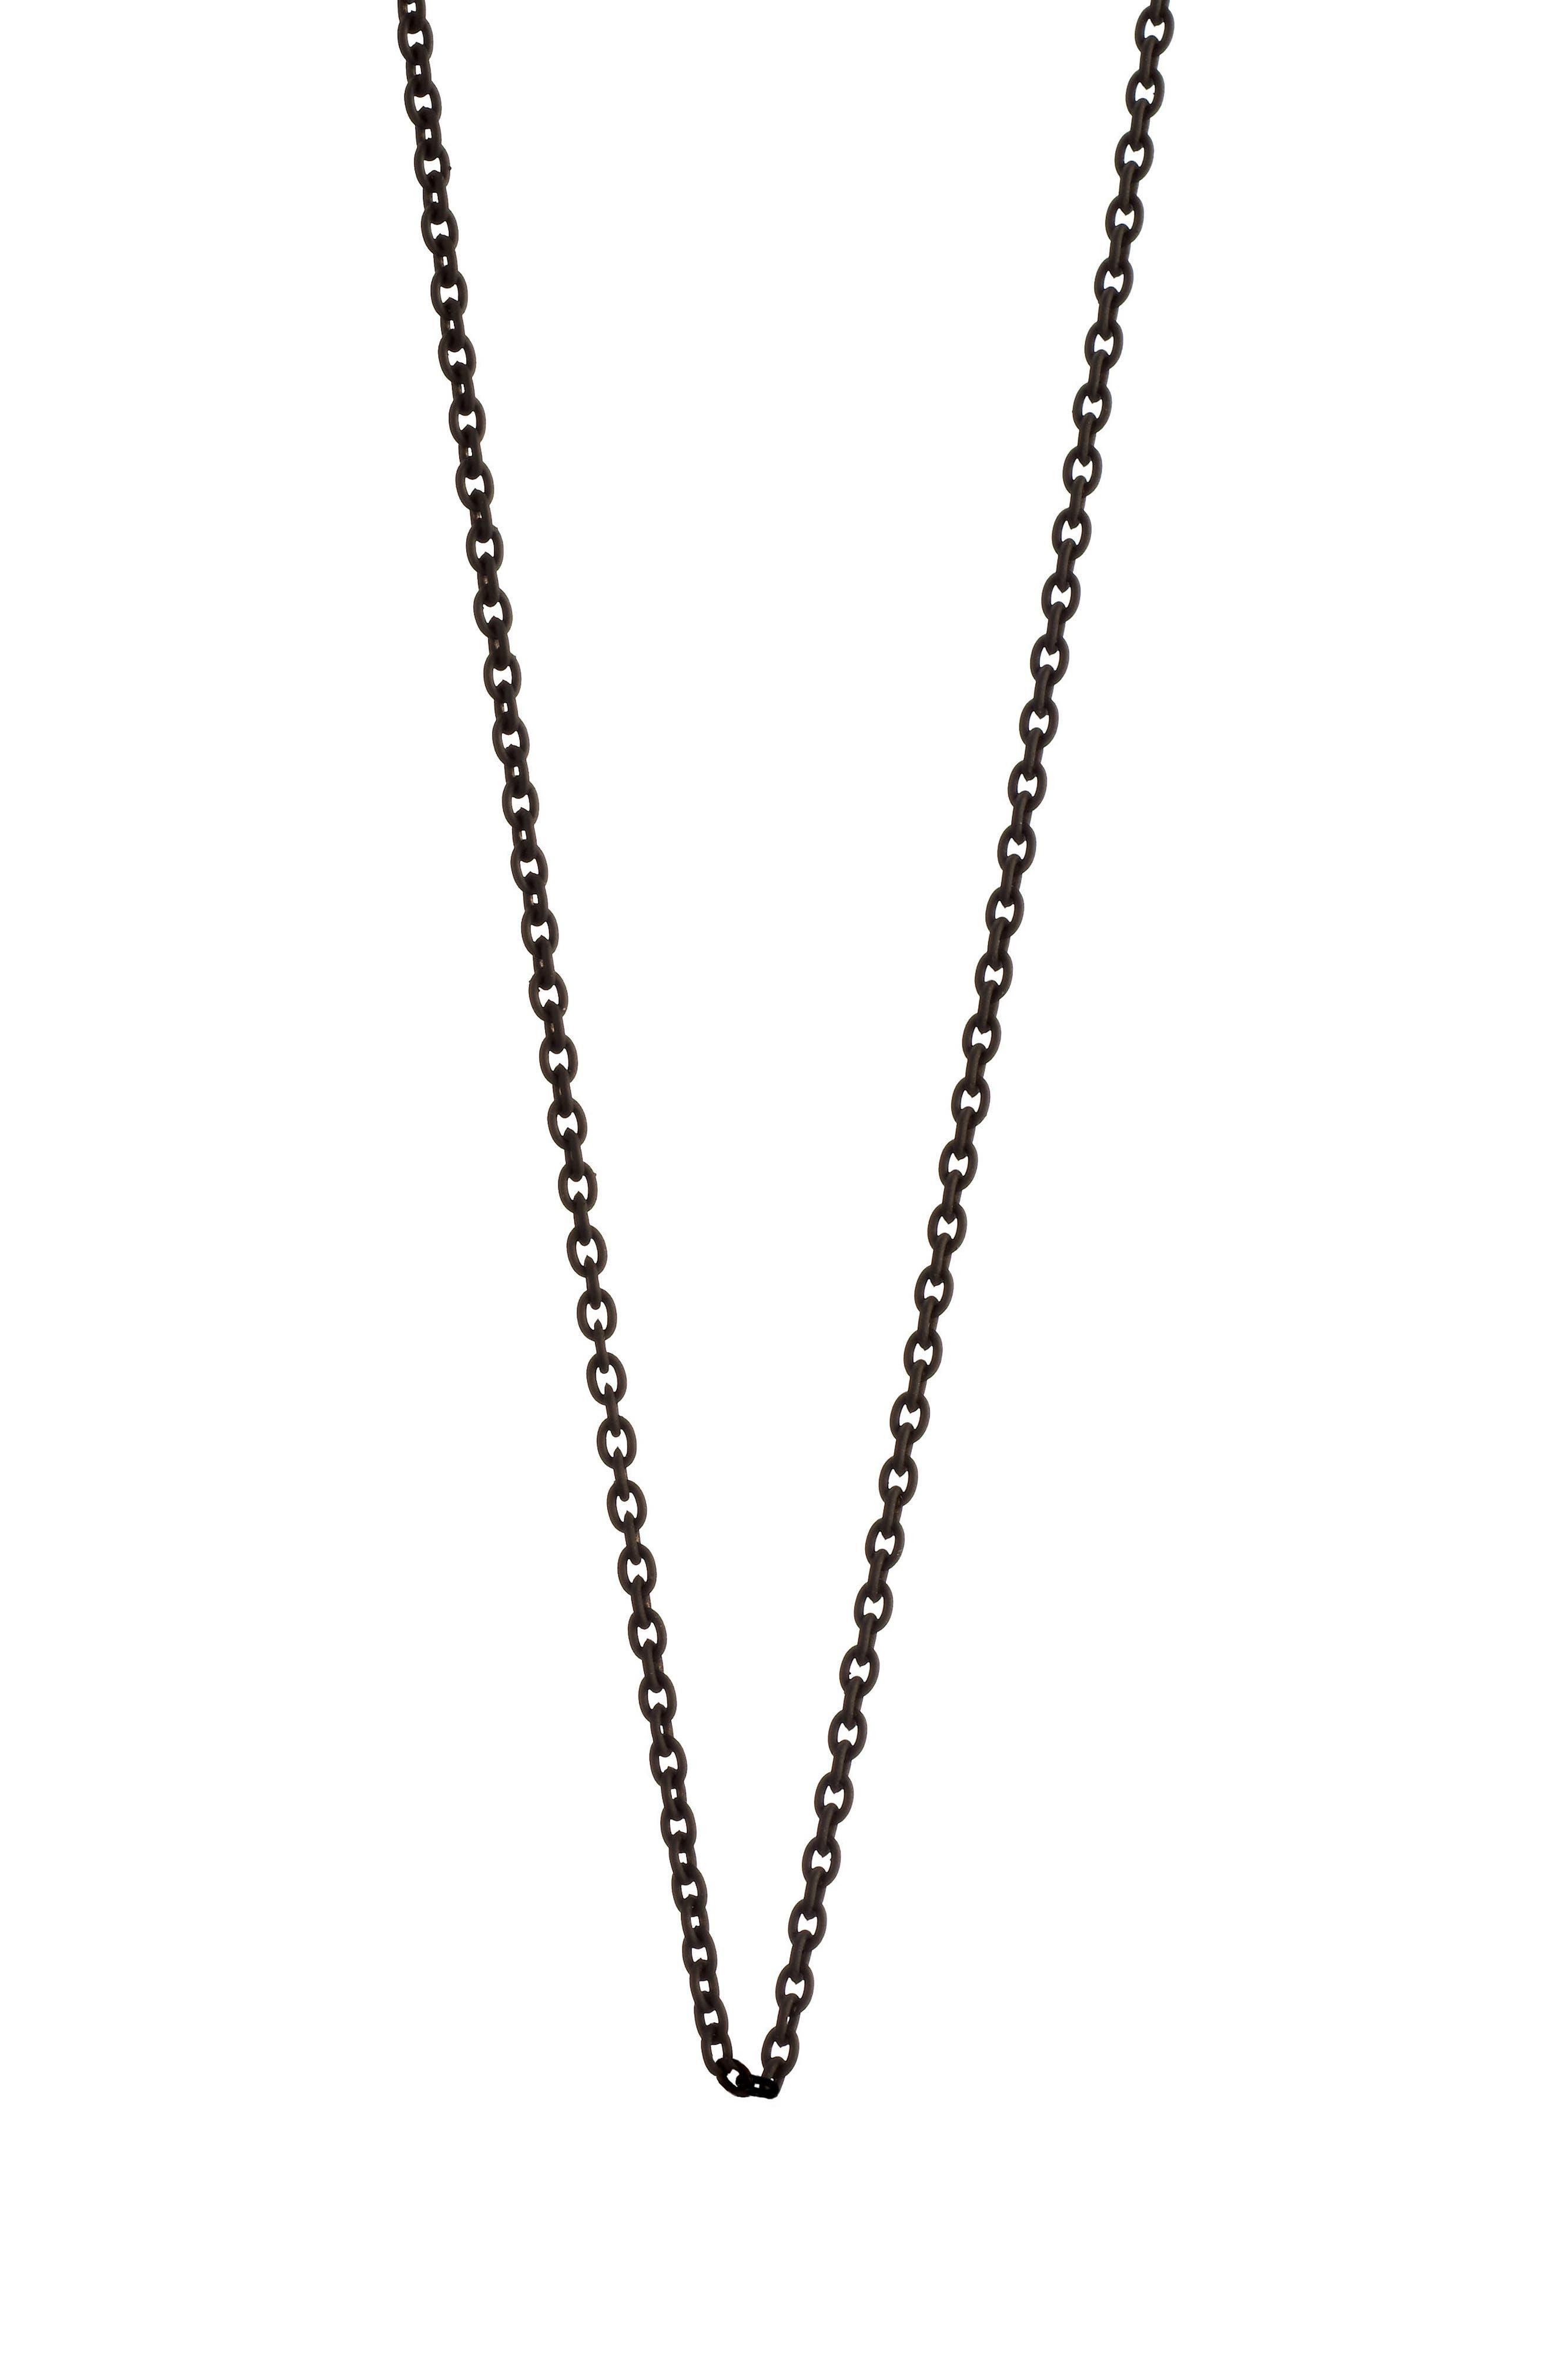 Delicate Black Steel Chain,                         Main,                         color, Black Steel